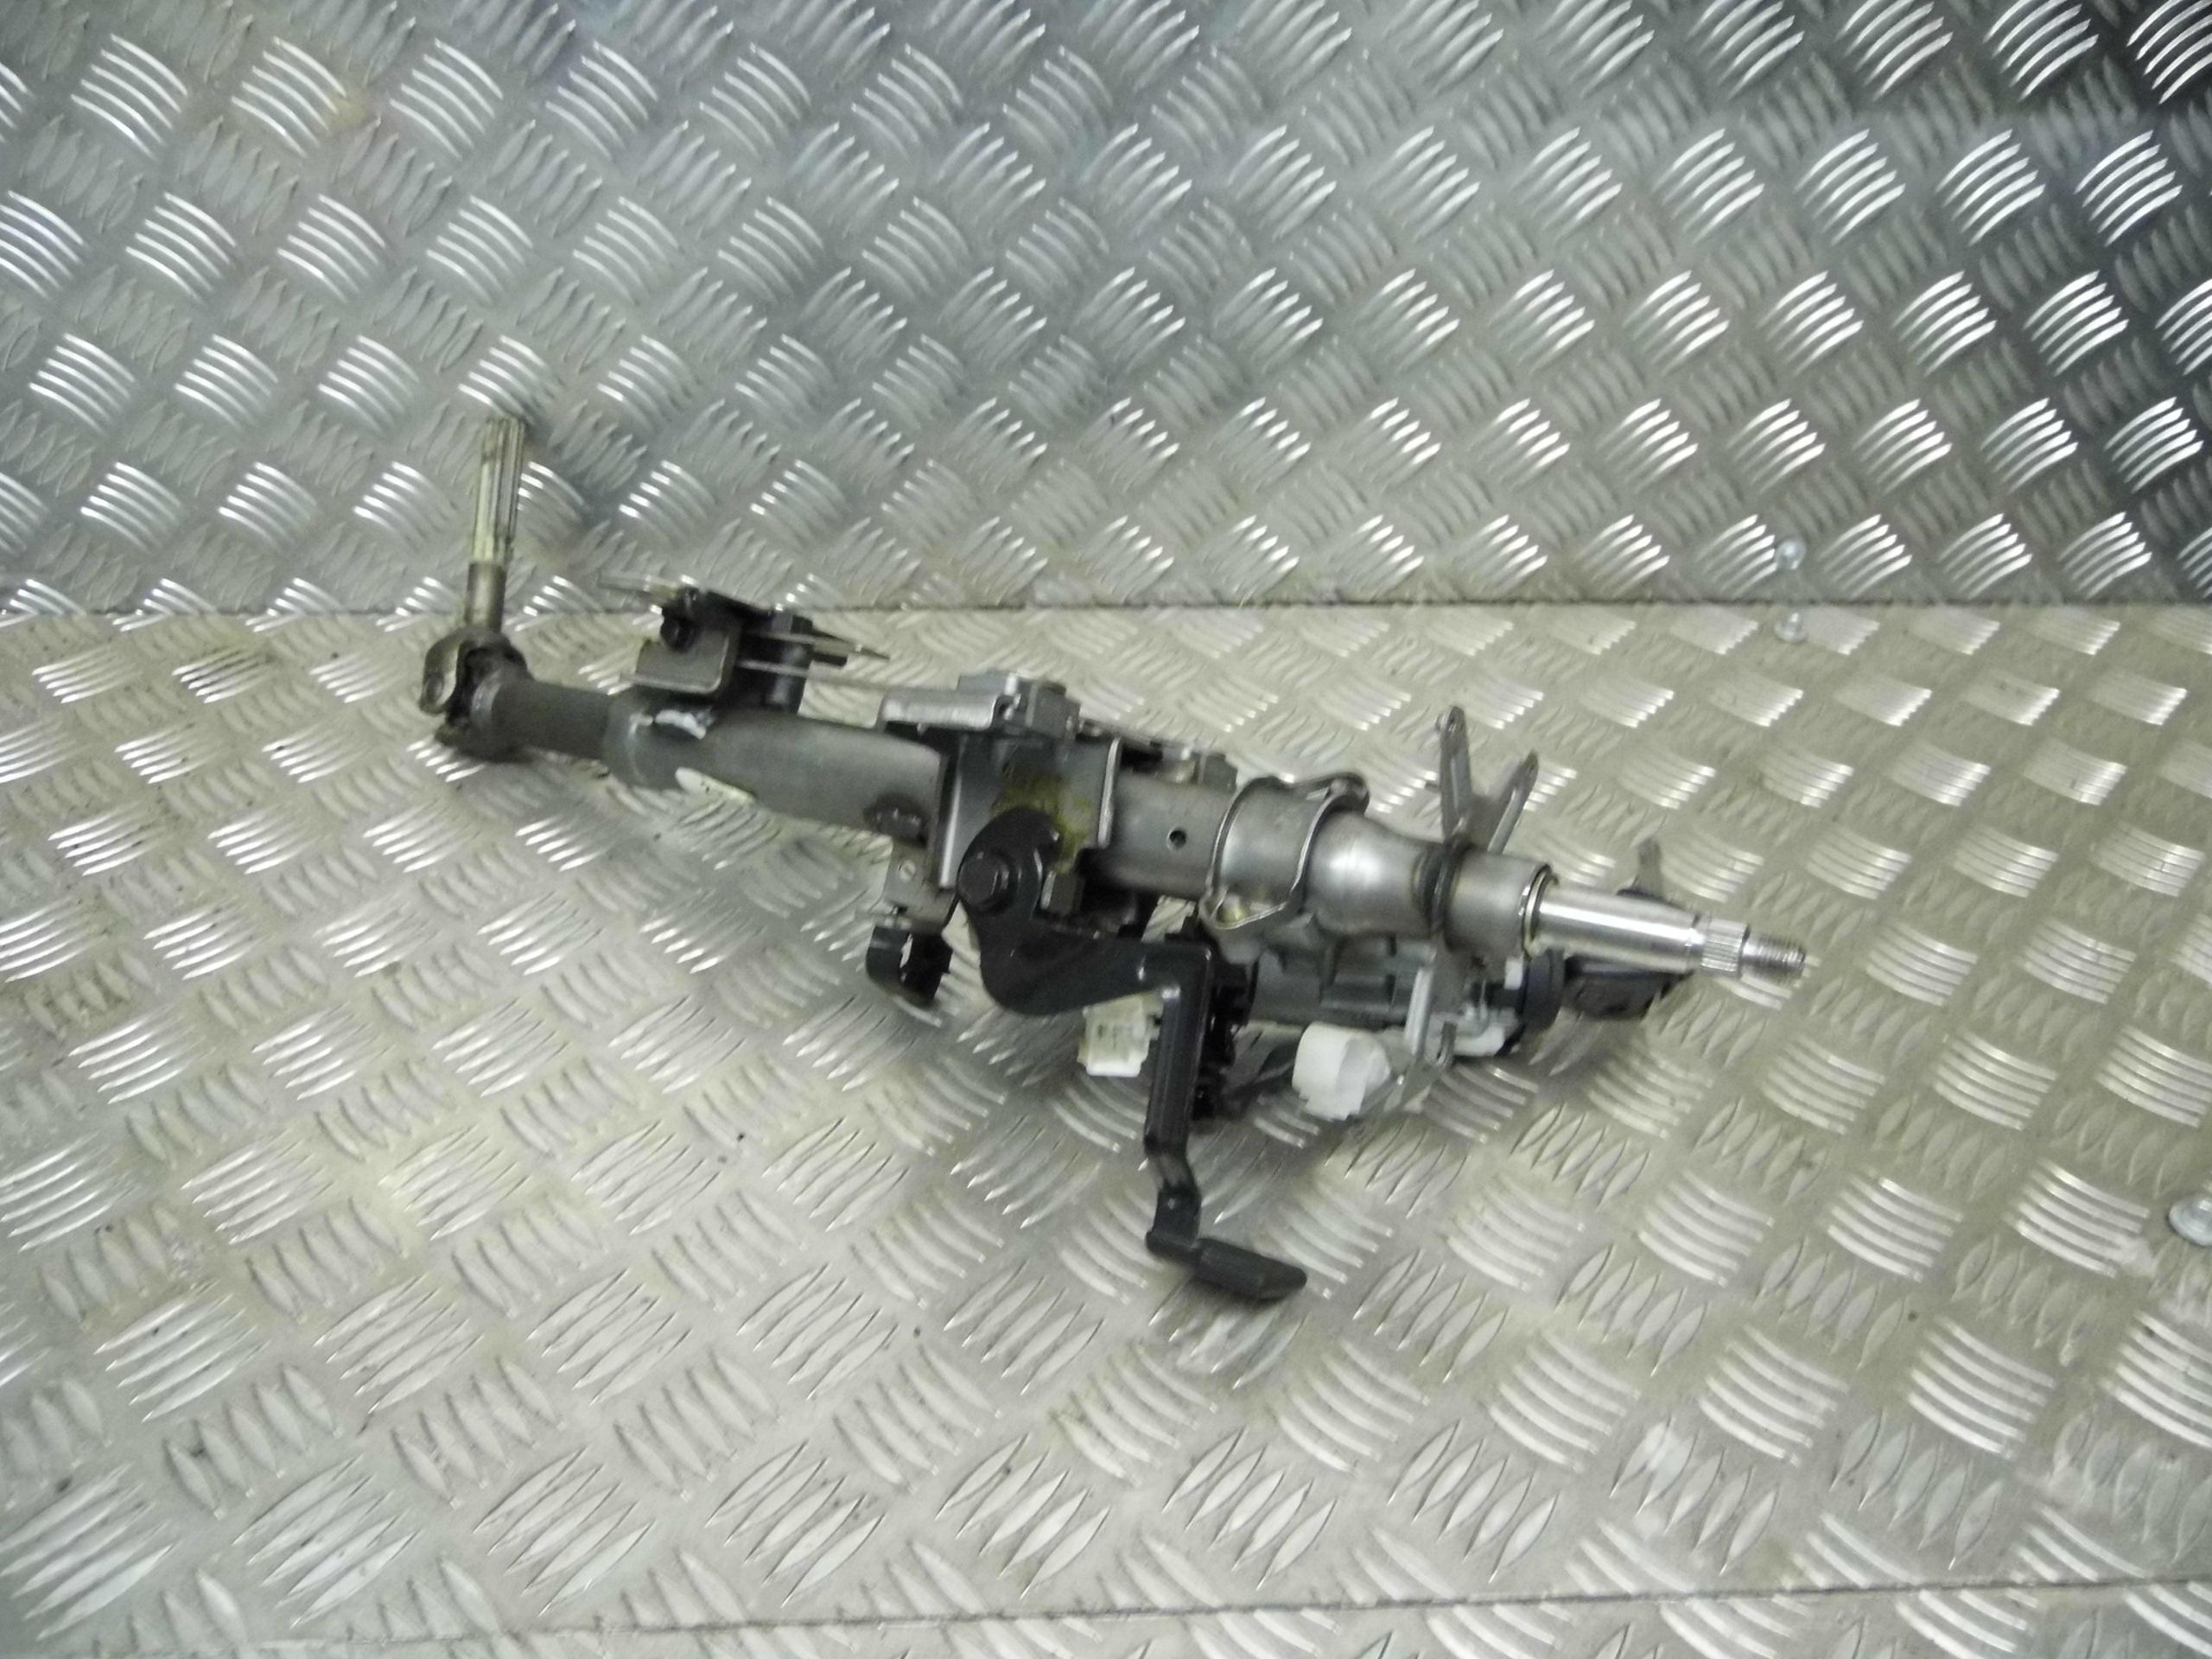 Used 2002 52 Toyota Avensis Adjustable Type Power